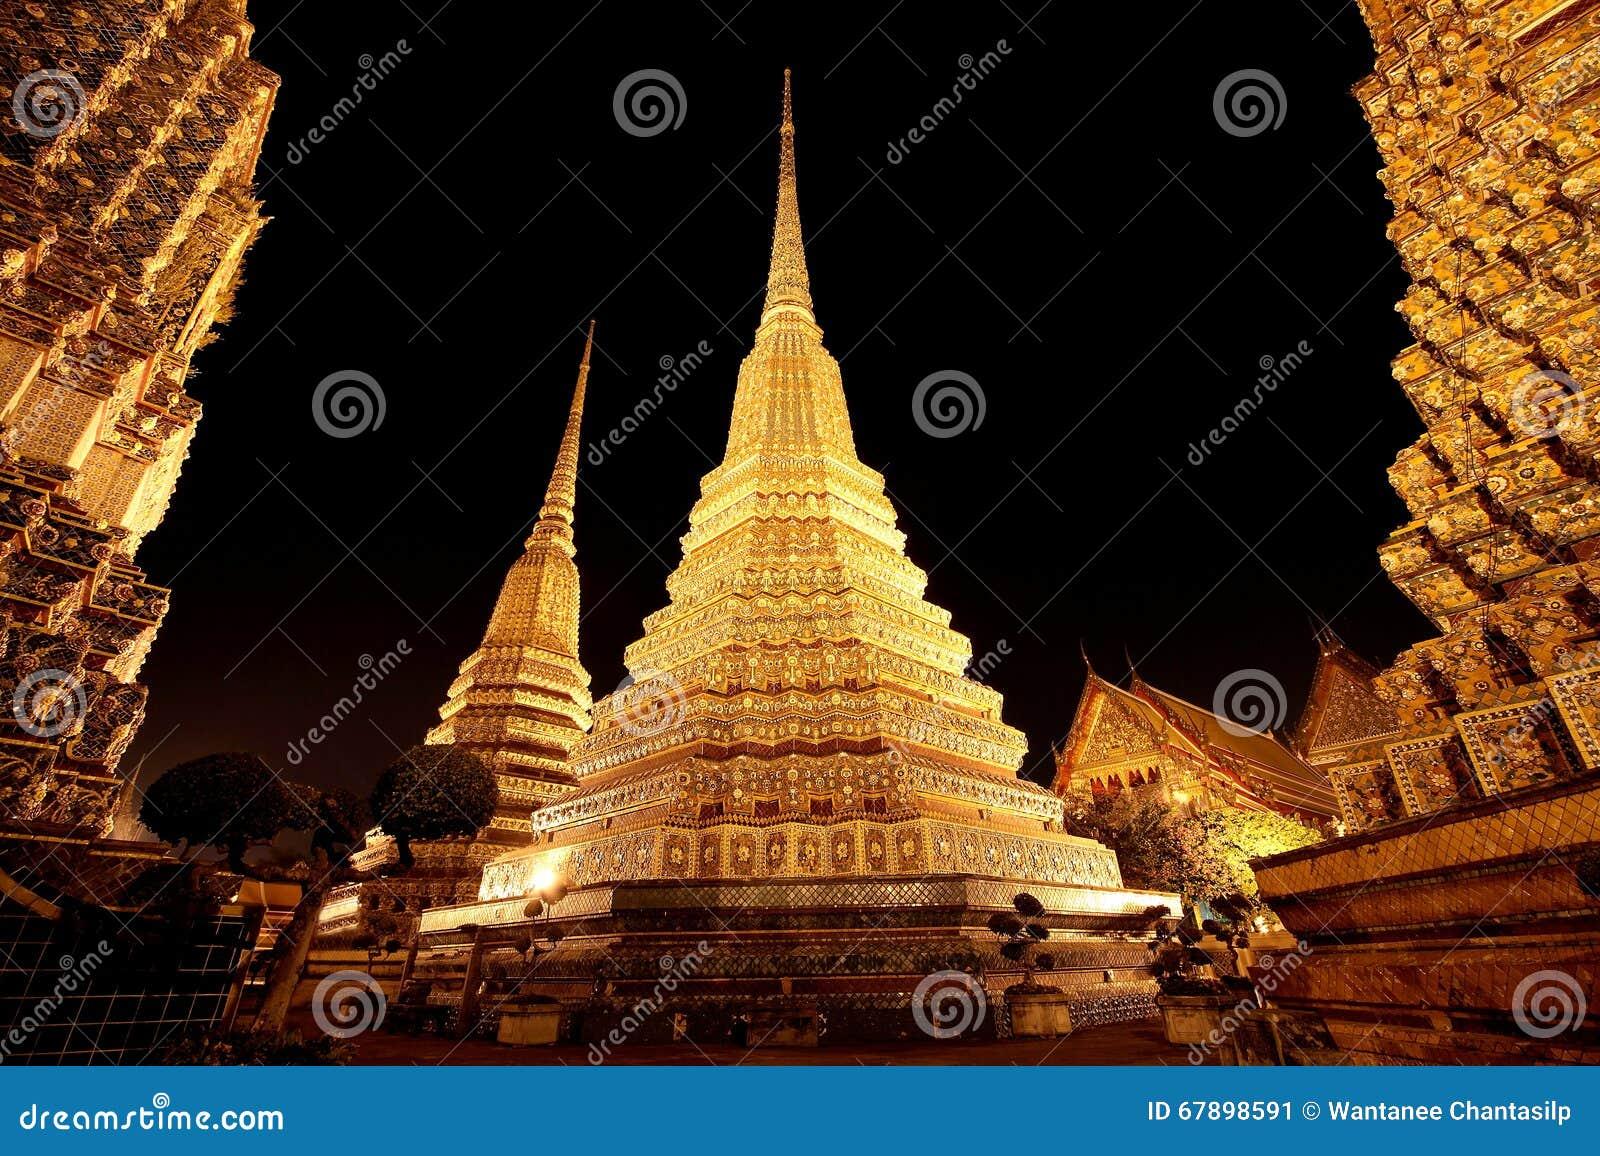 Wat Pho 4 stupas在晚上